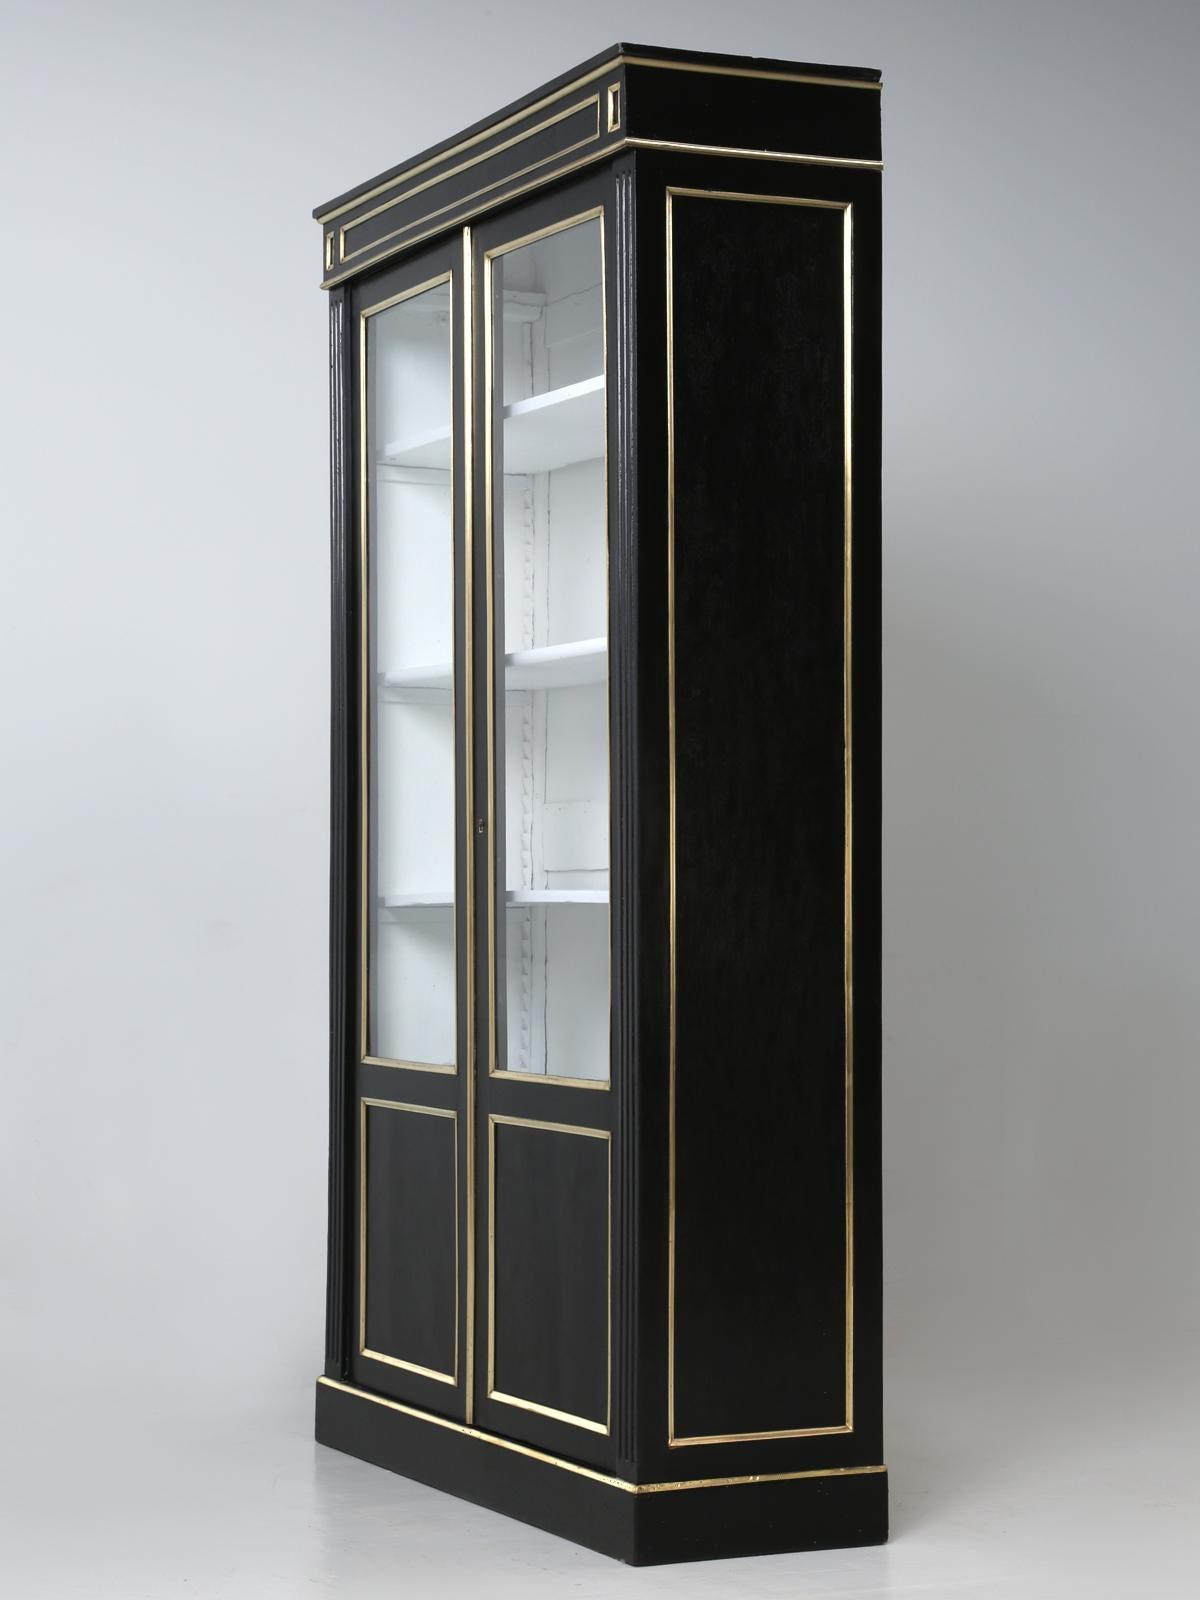 Antique French Louis Xvi Ebonized Mahogany Bookcase Fully Restored